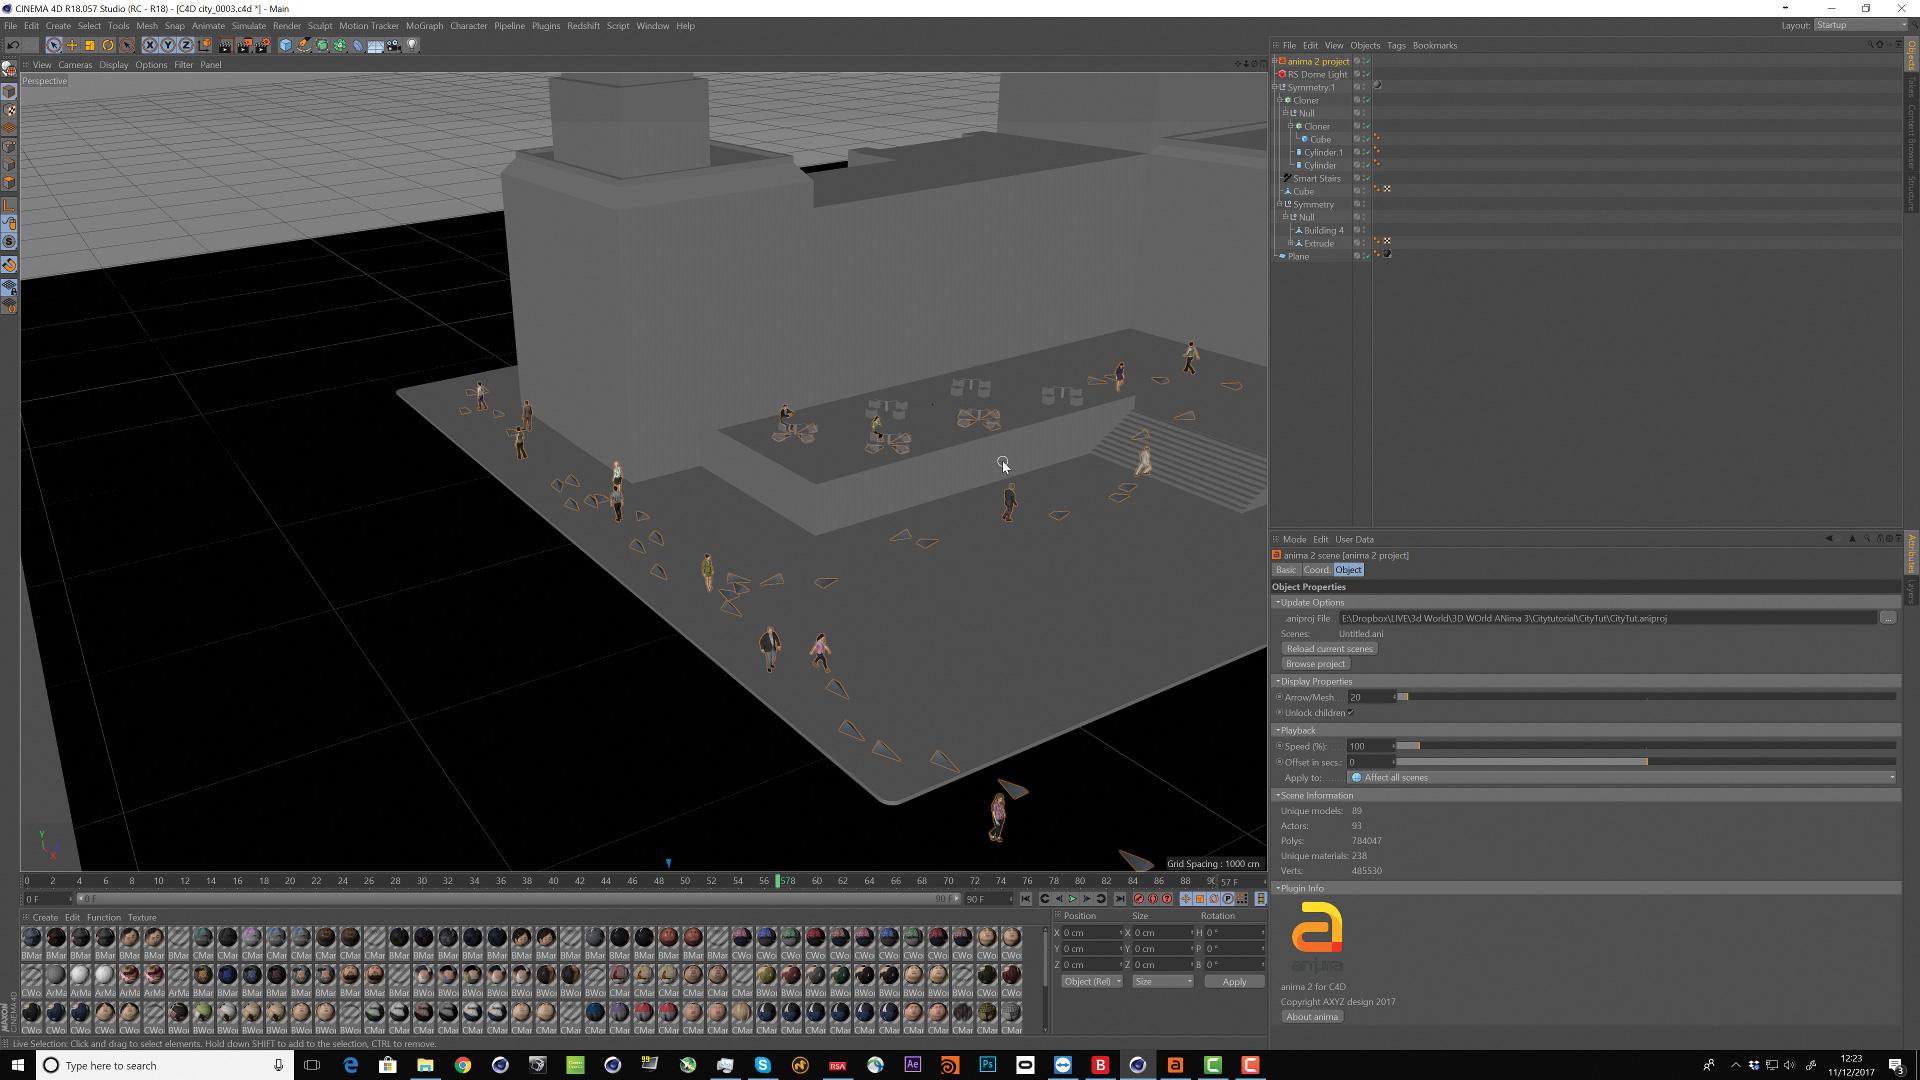 Create complex crowd scenes easily with Anima - Graphic Design